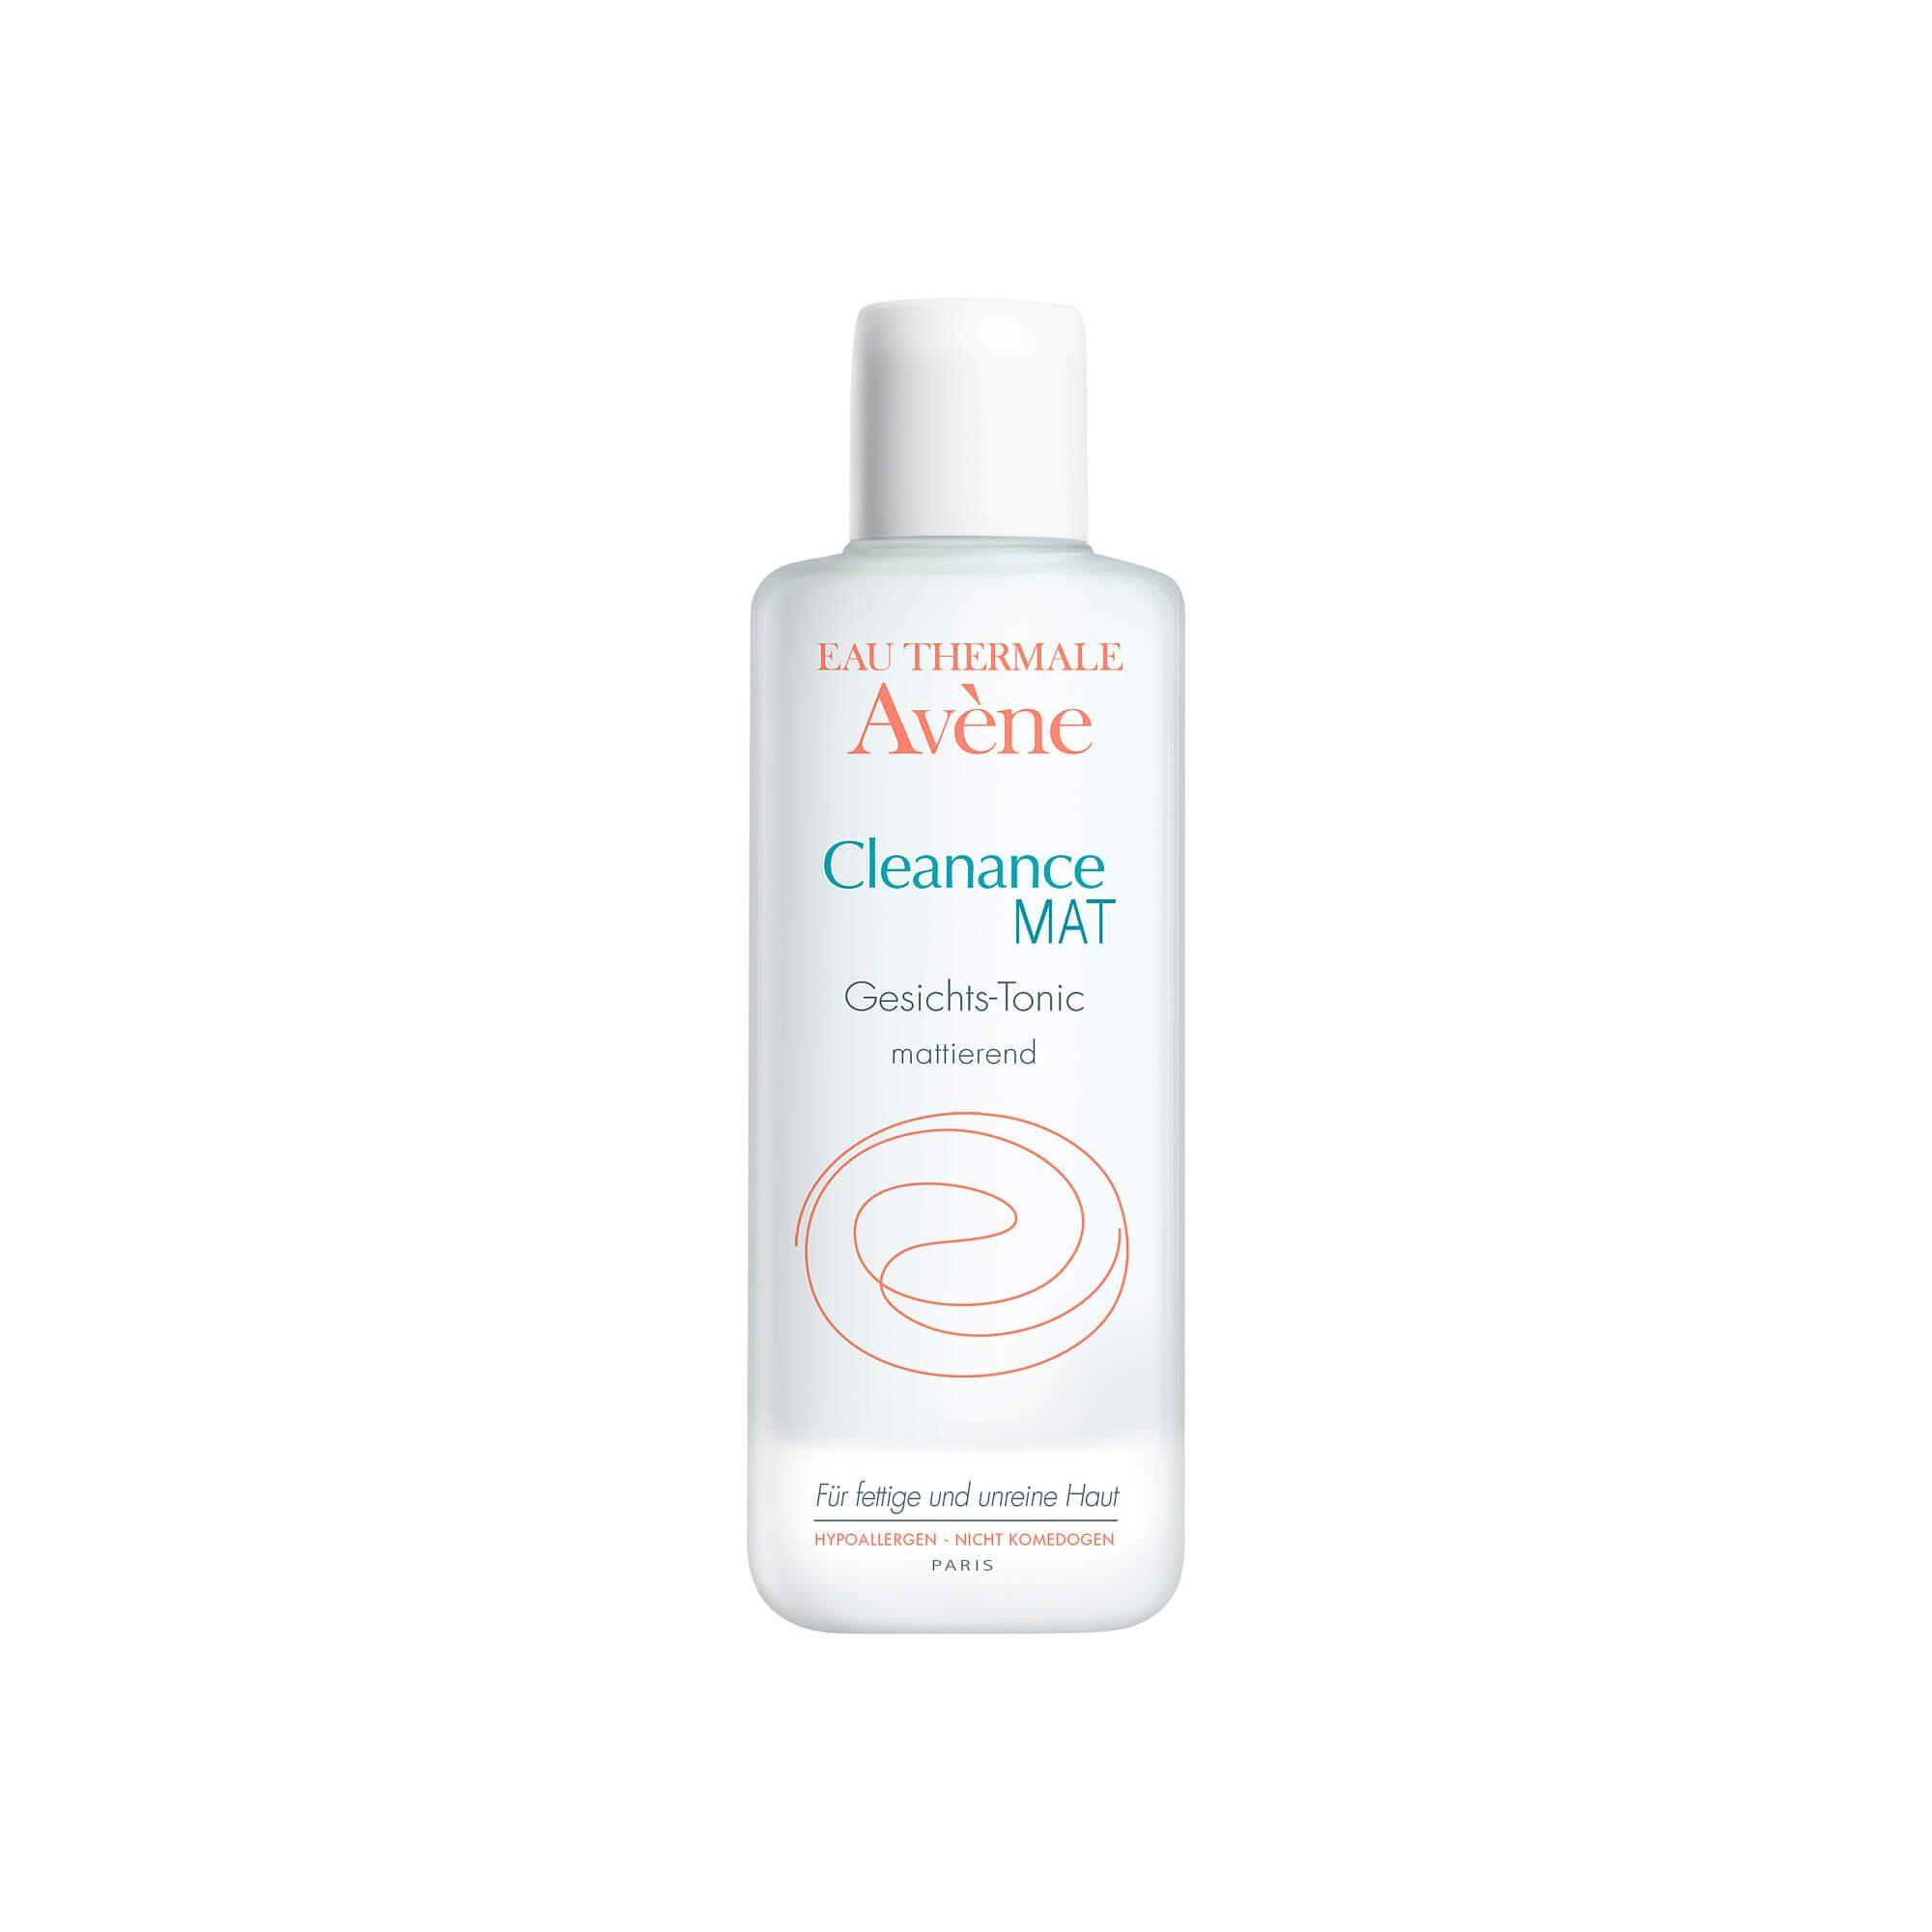 Avene Avene Cleanance Gesichts-Tonic Mattierend, 200 ml